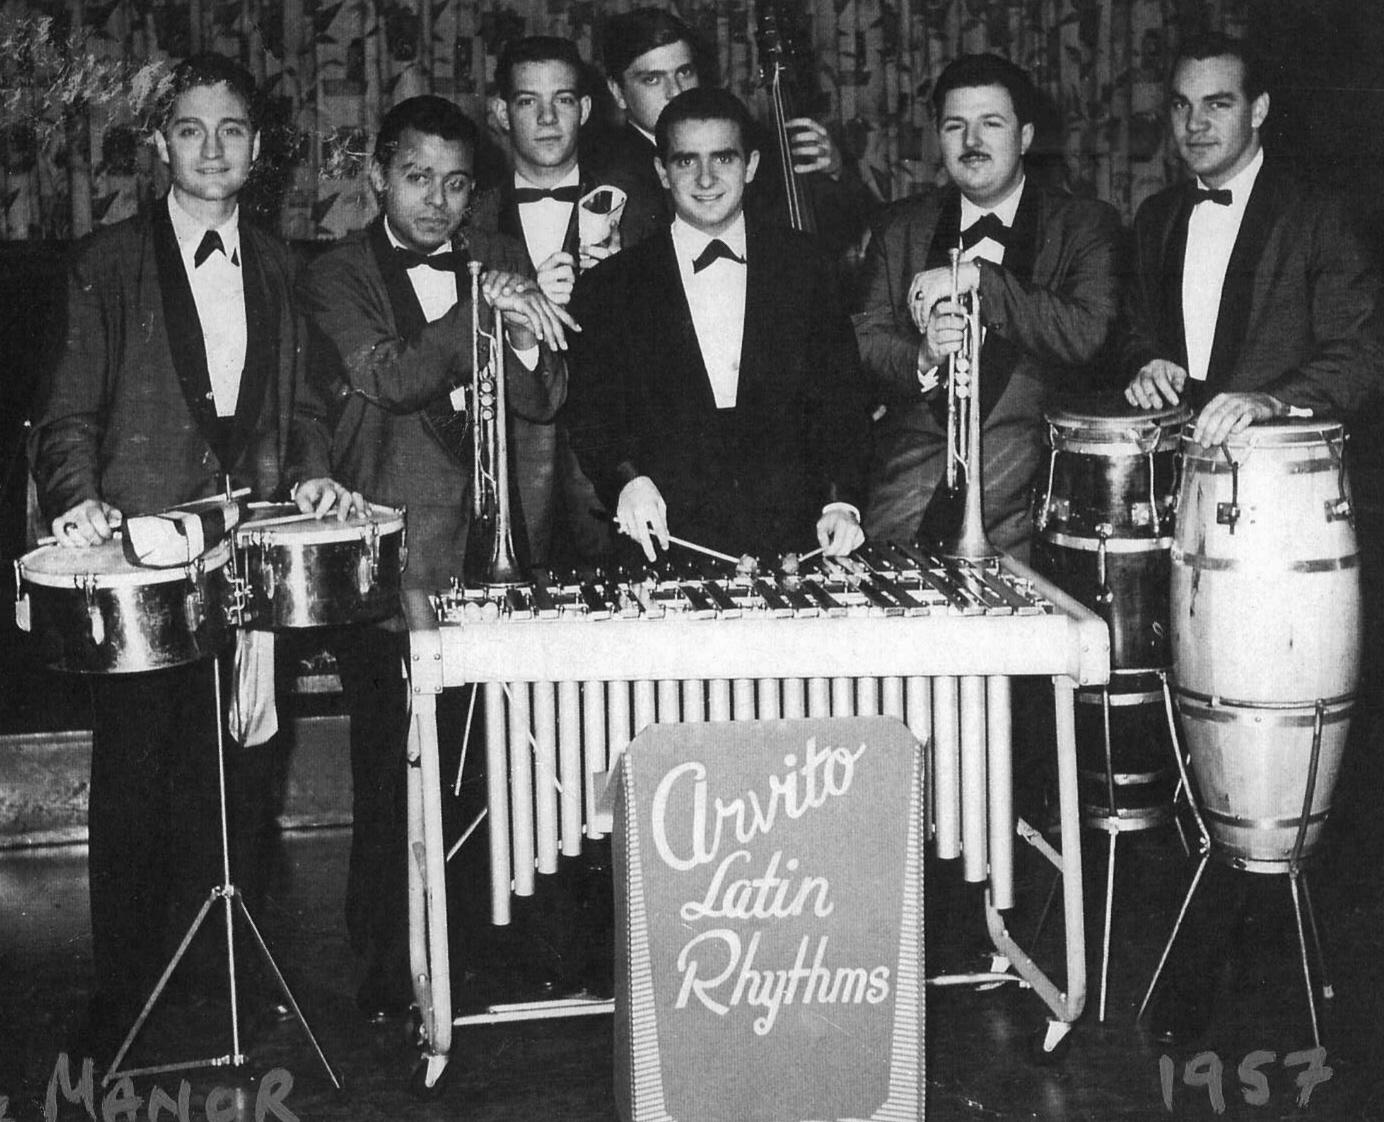 Arvito band 1957 jpg.jpg